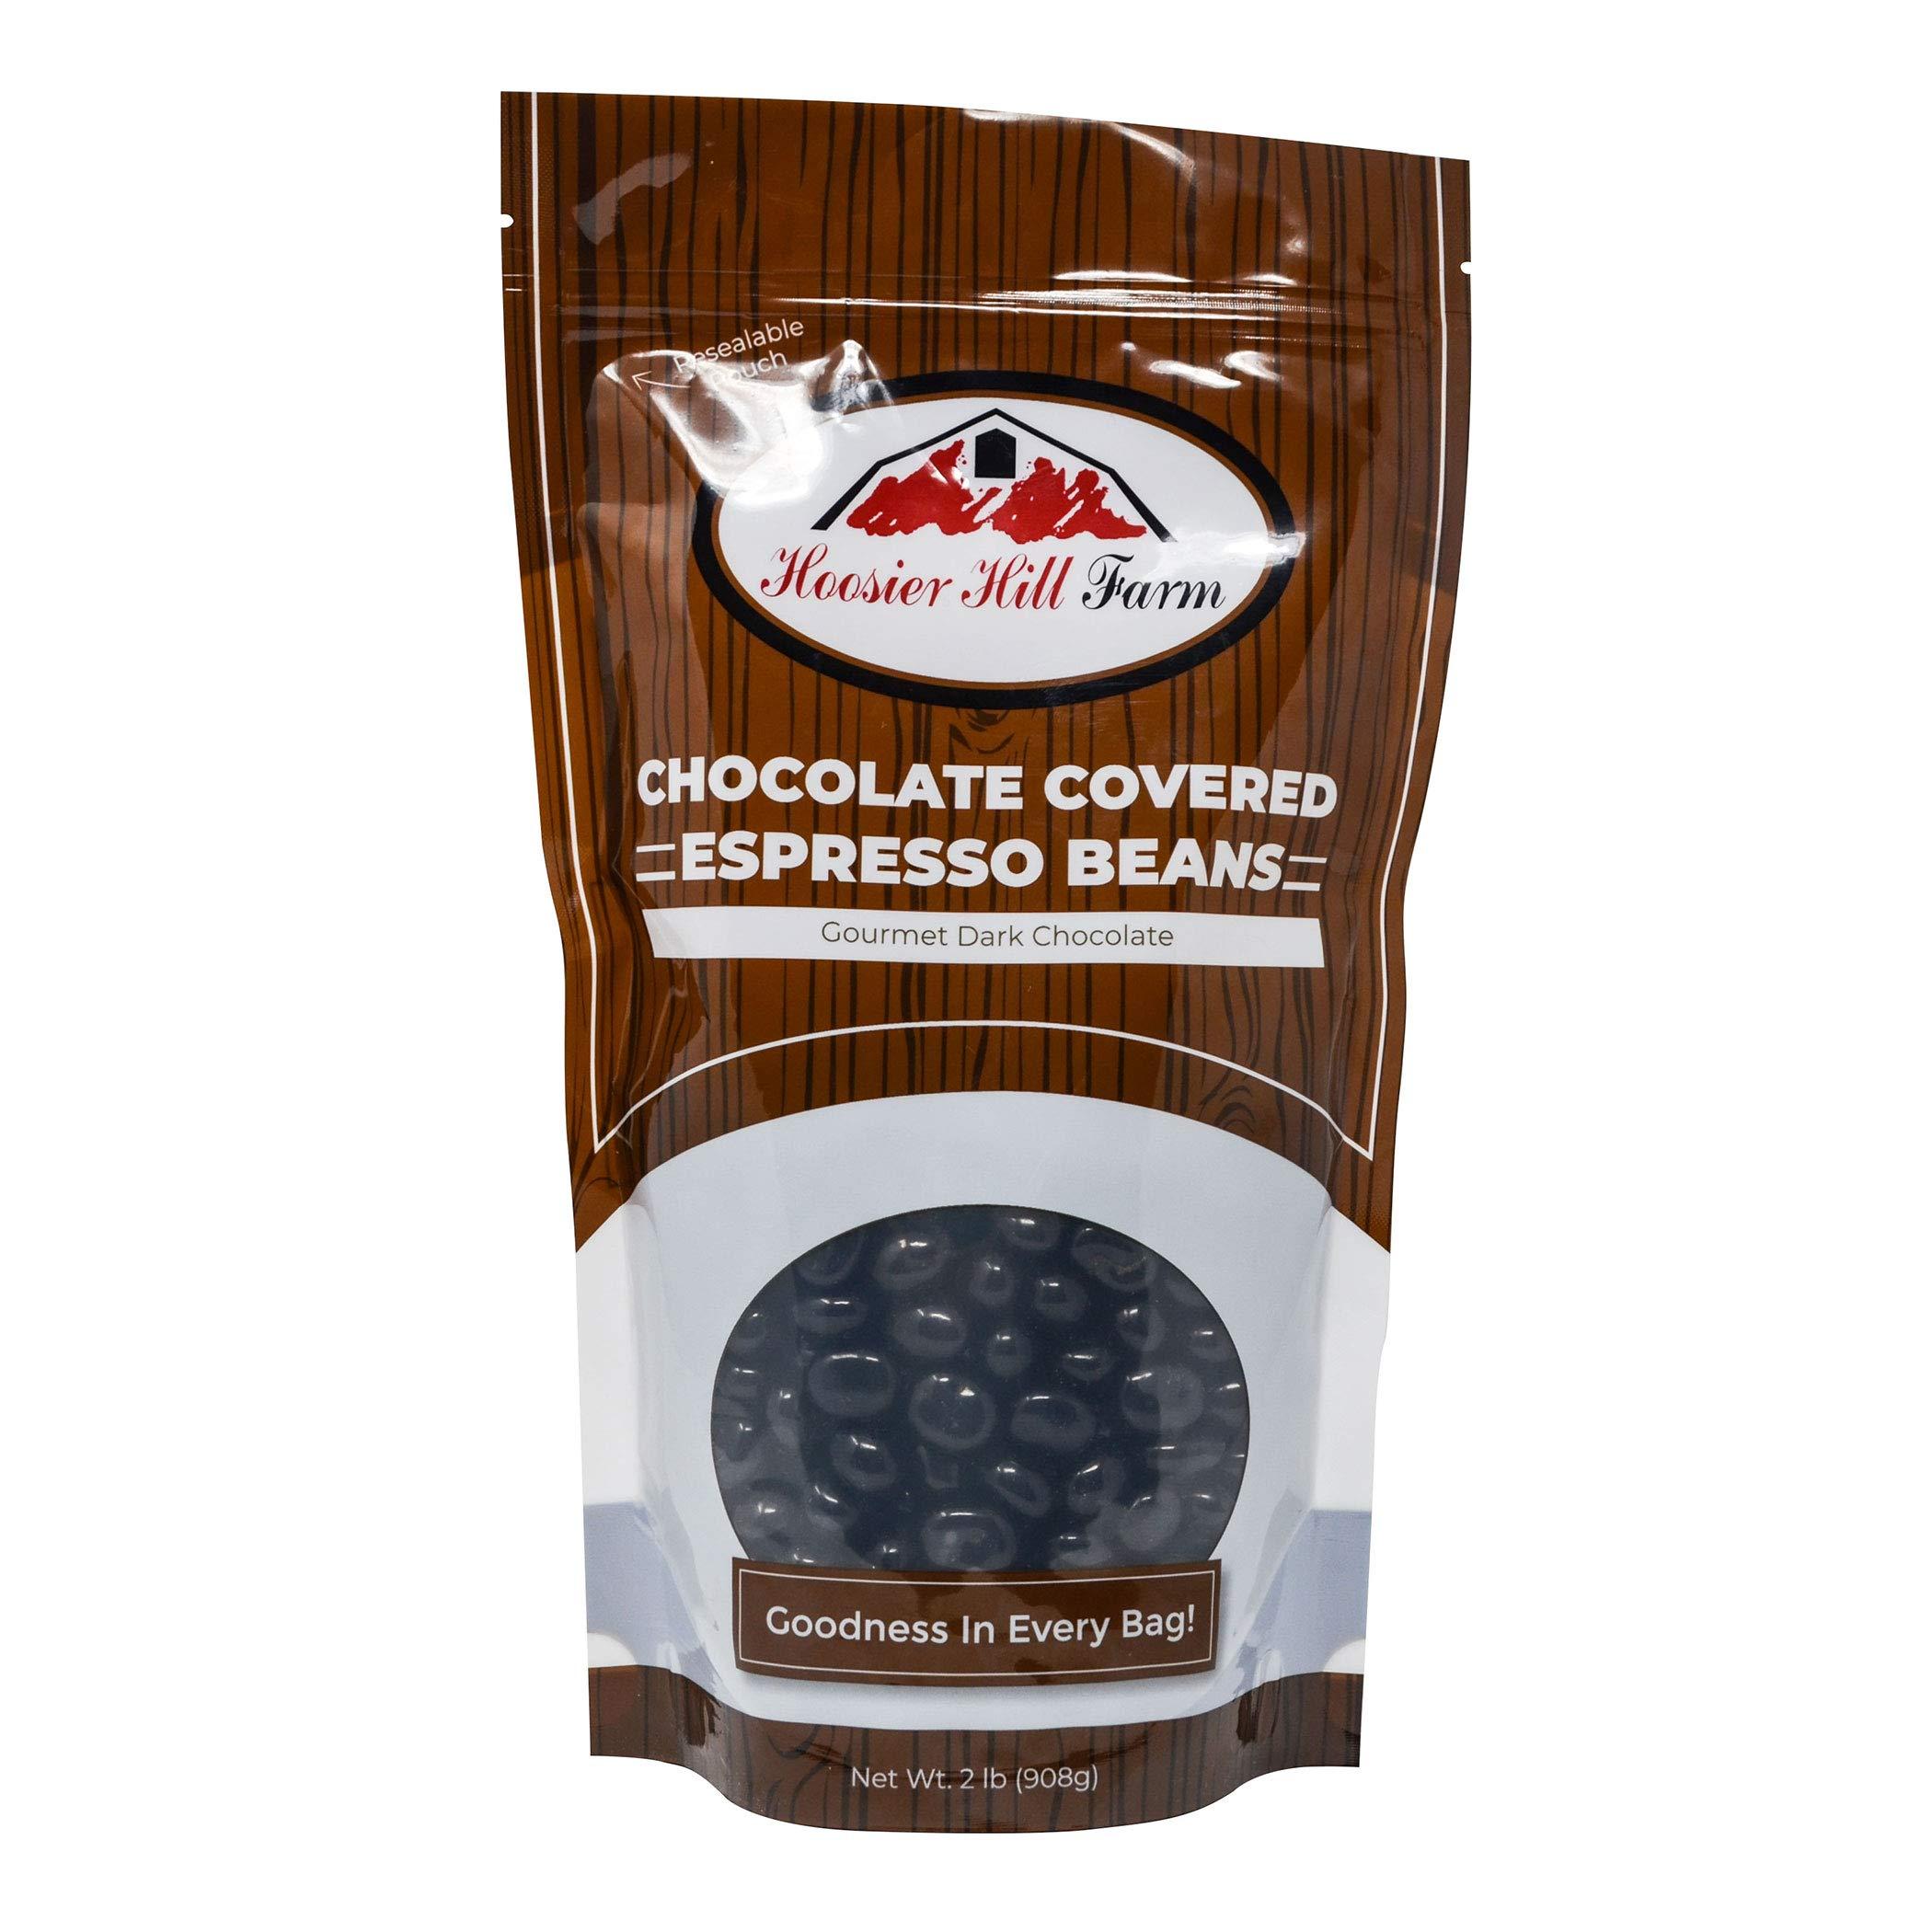 Hill Farm Gourmet Dark Chocolate covered Espresso Beans (2 lb Bag), 32 Ounce by Hoosier Hill Farm